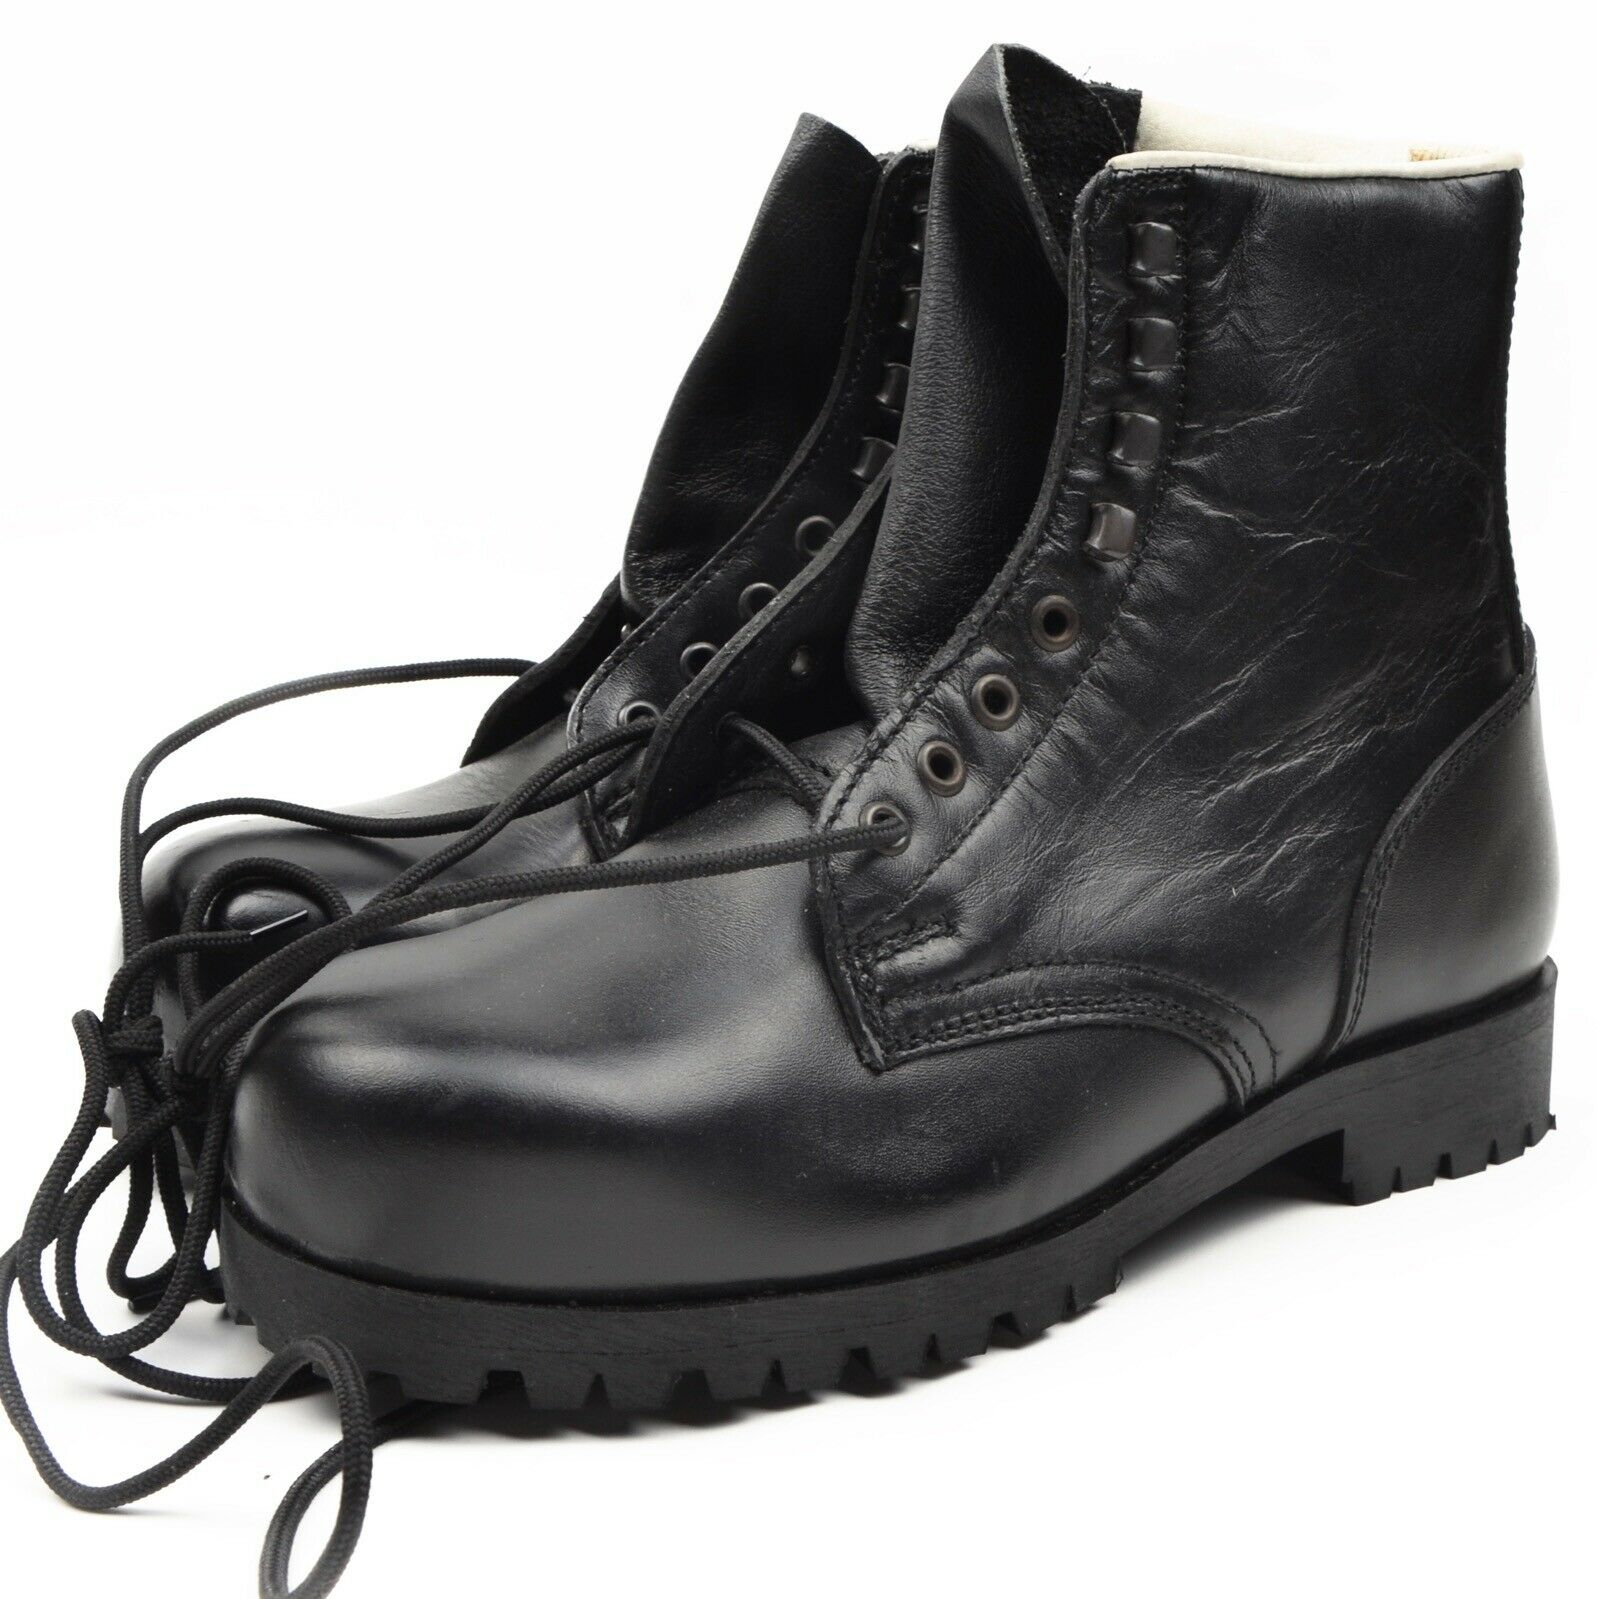 Rukapol botas botas Stahlkappe Steel Toe Gr 41 Ungetragen negro Sicherheit